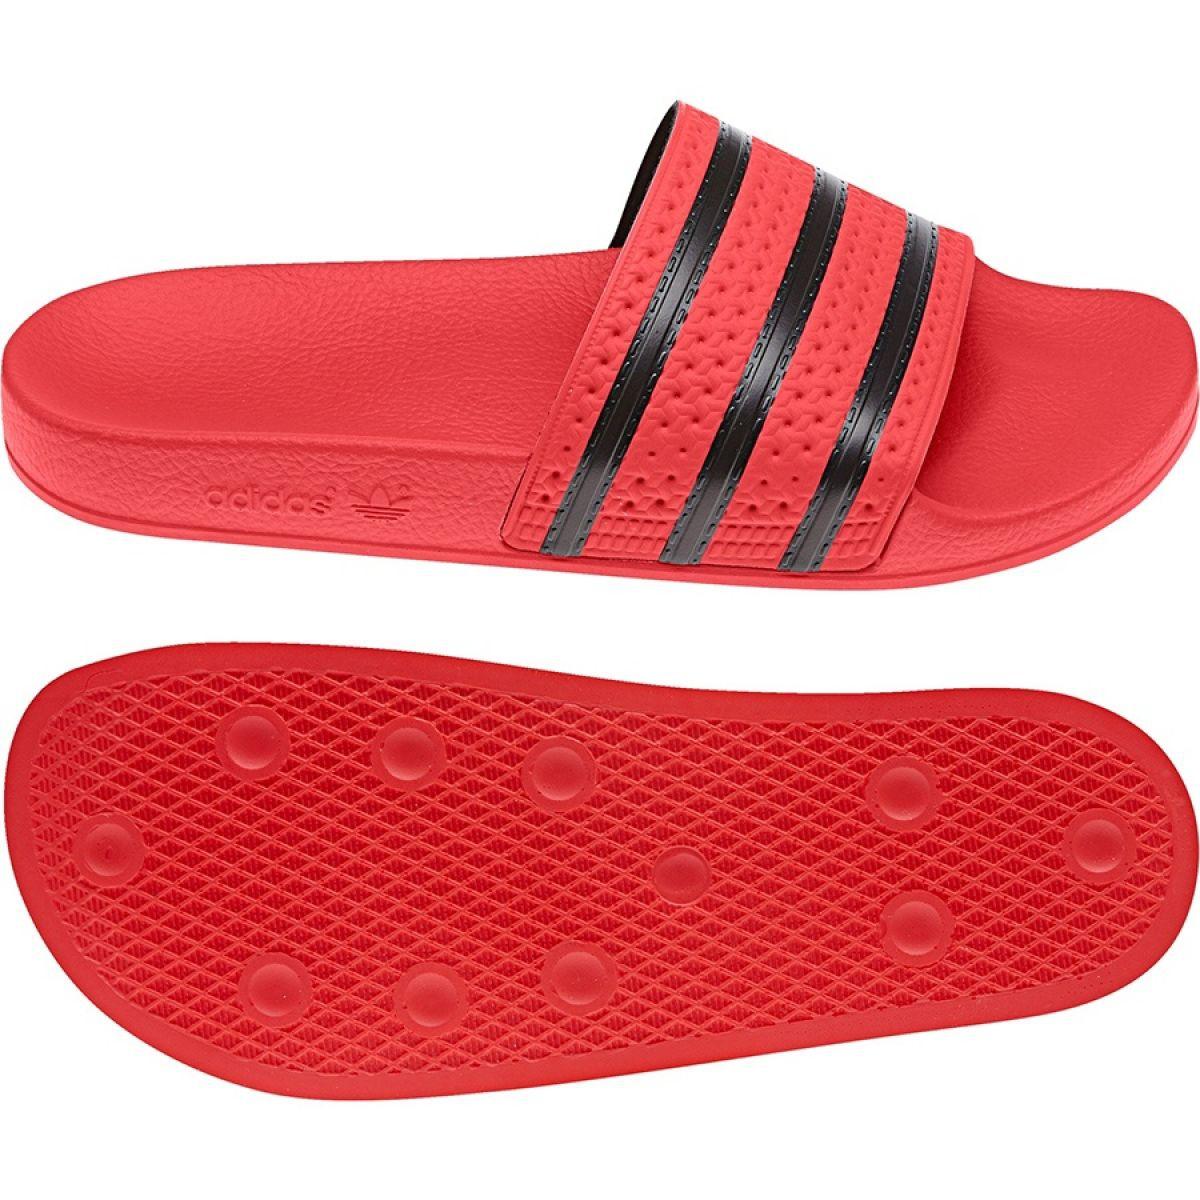 Adidas Originals Sandals diapositives U cq3098